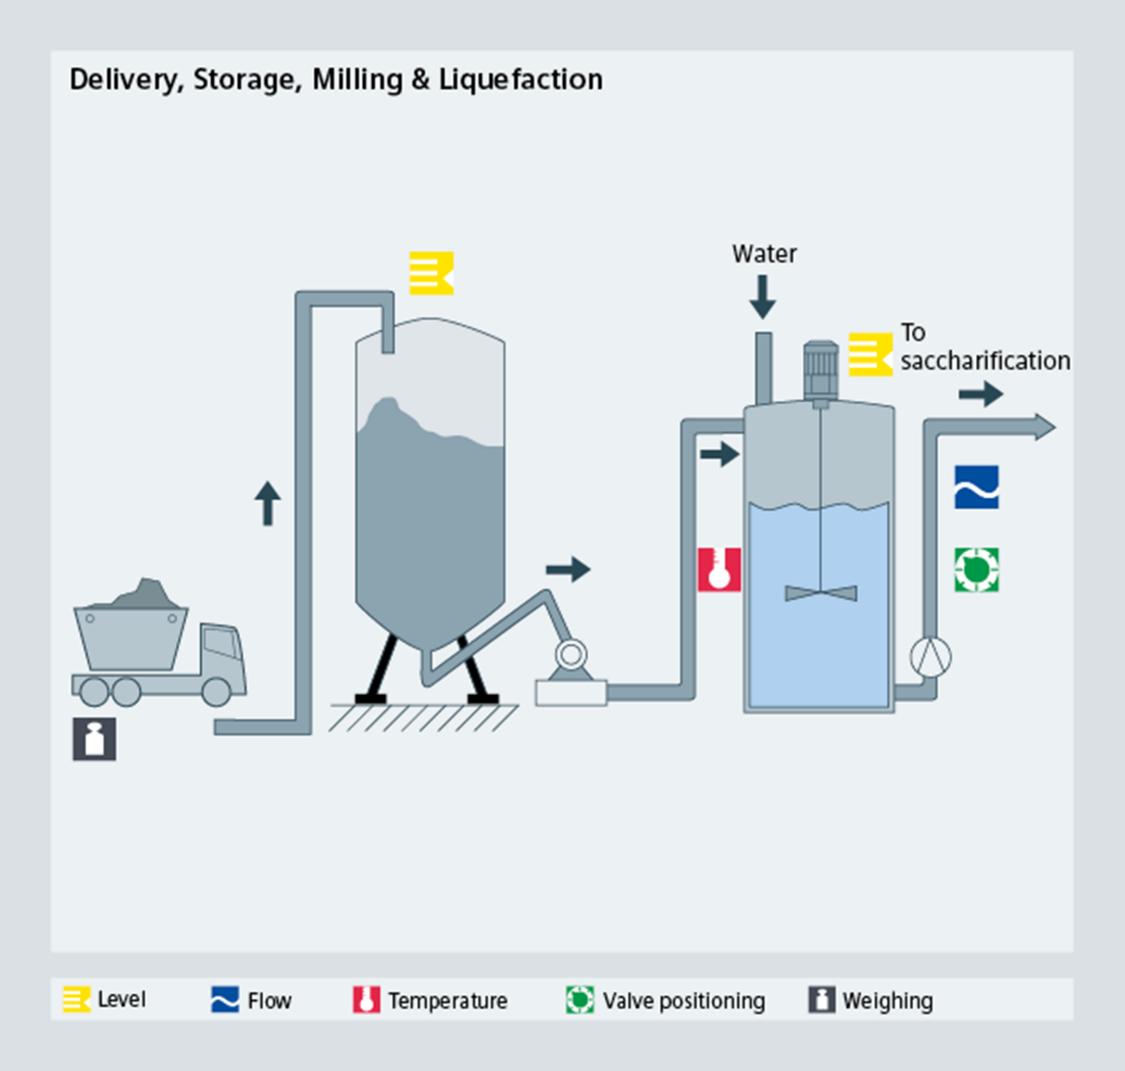 Bioethanol delivery, storage, milling, liquefaction - Siemens USA